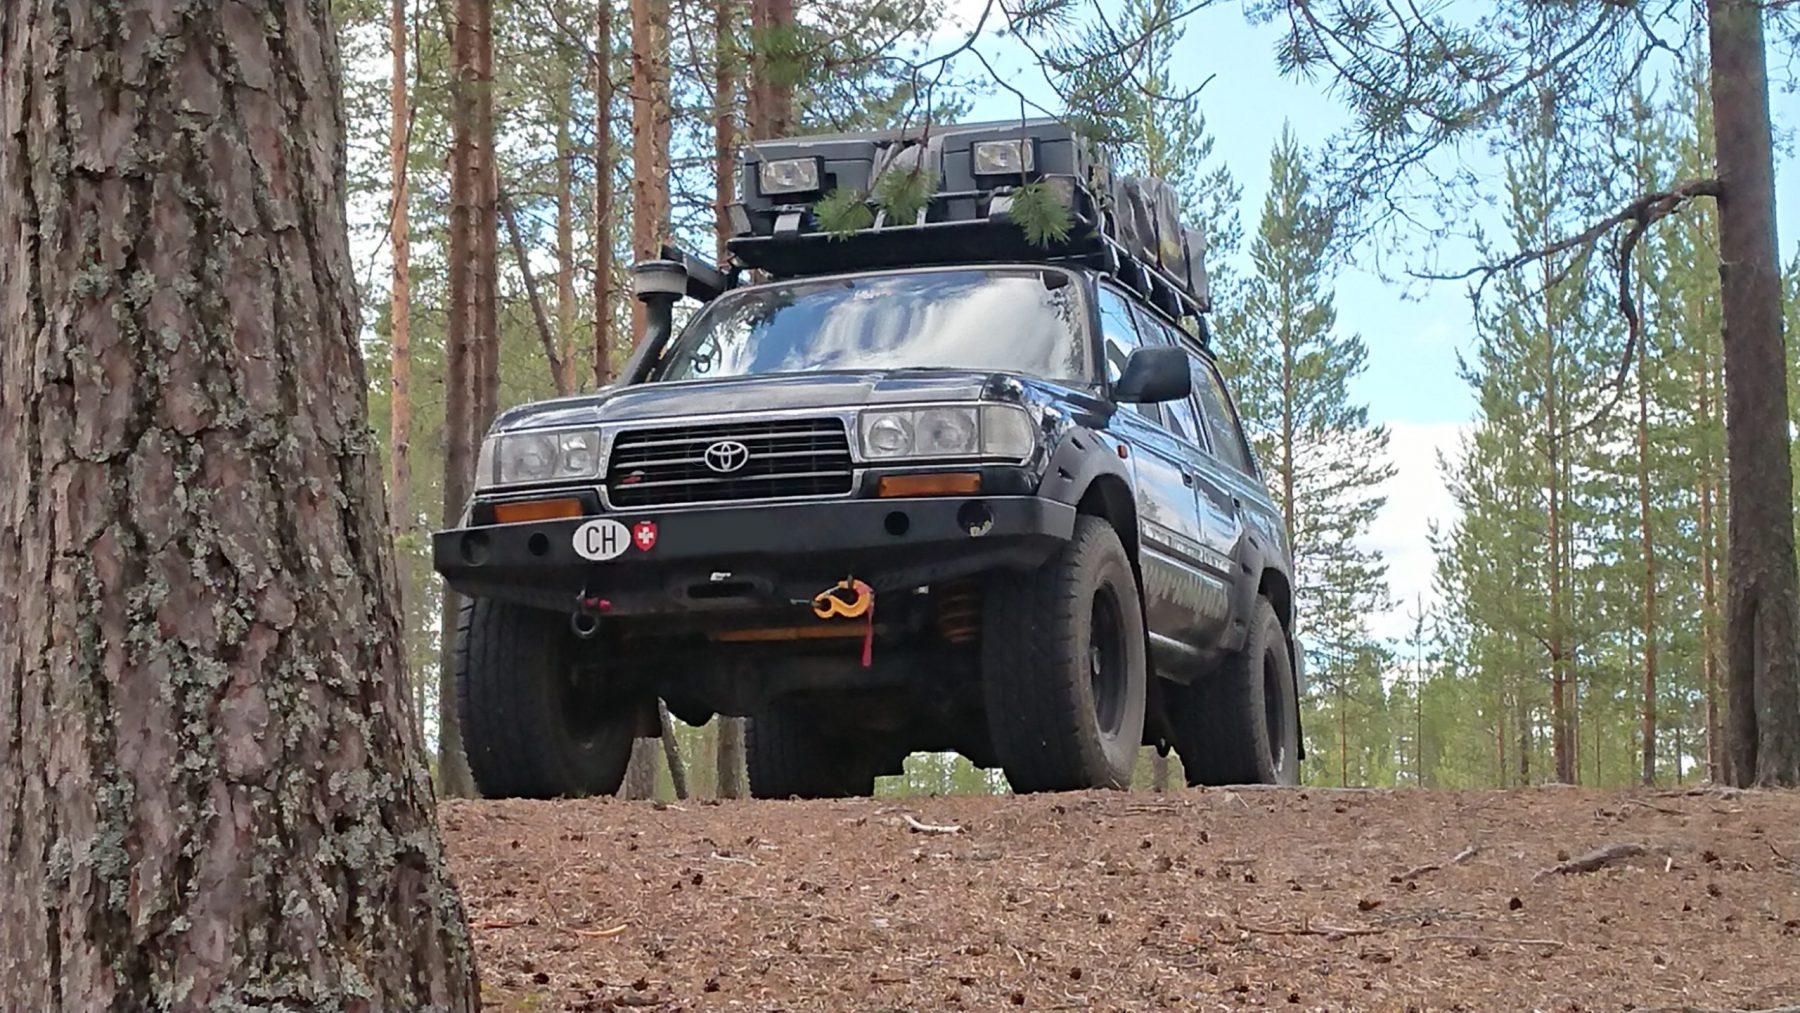 Off-Tech Toyota Land Cruiser HDJ80